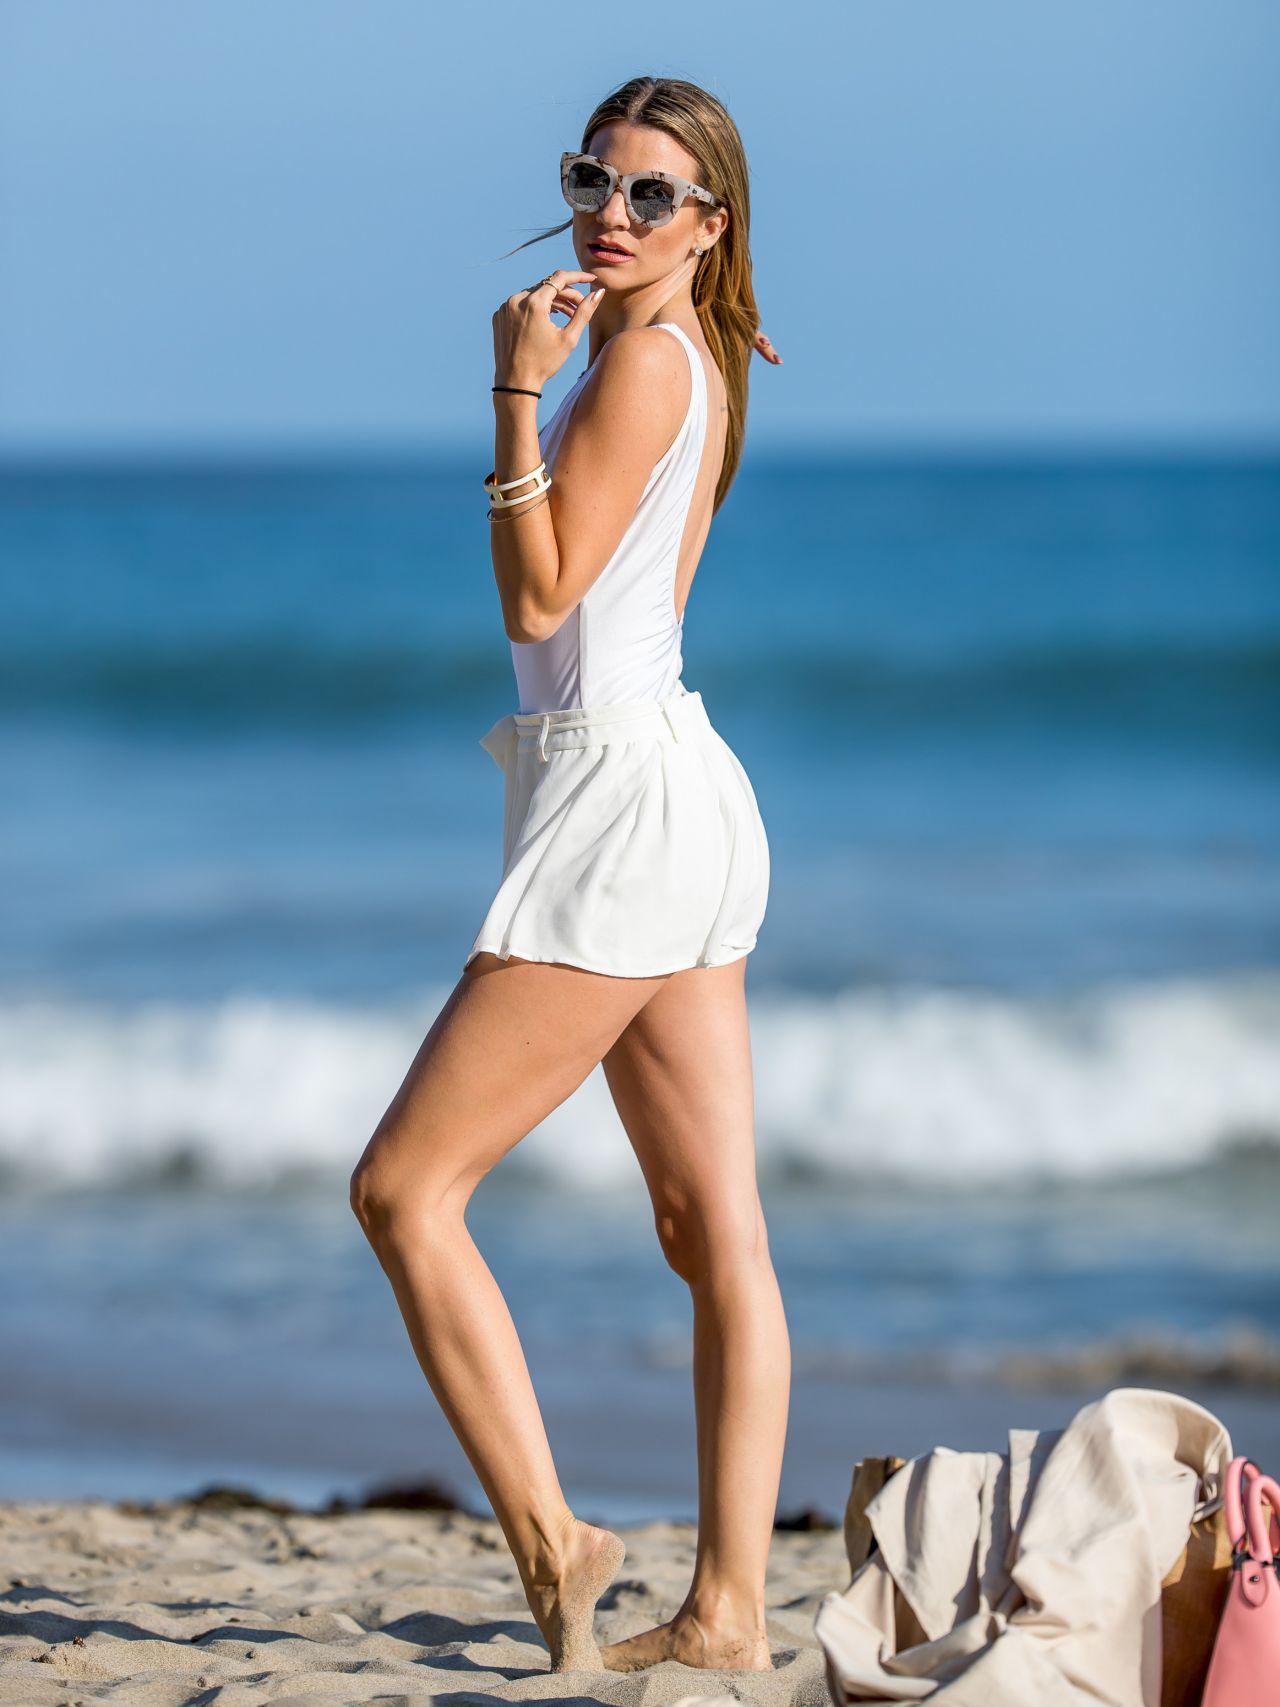 Rachel Mccord In A Bikini At The Beach In Los Angeles 5